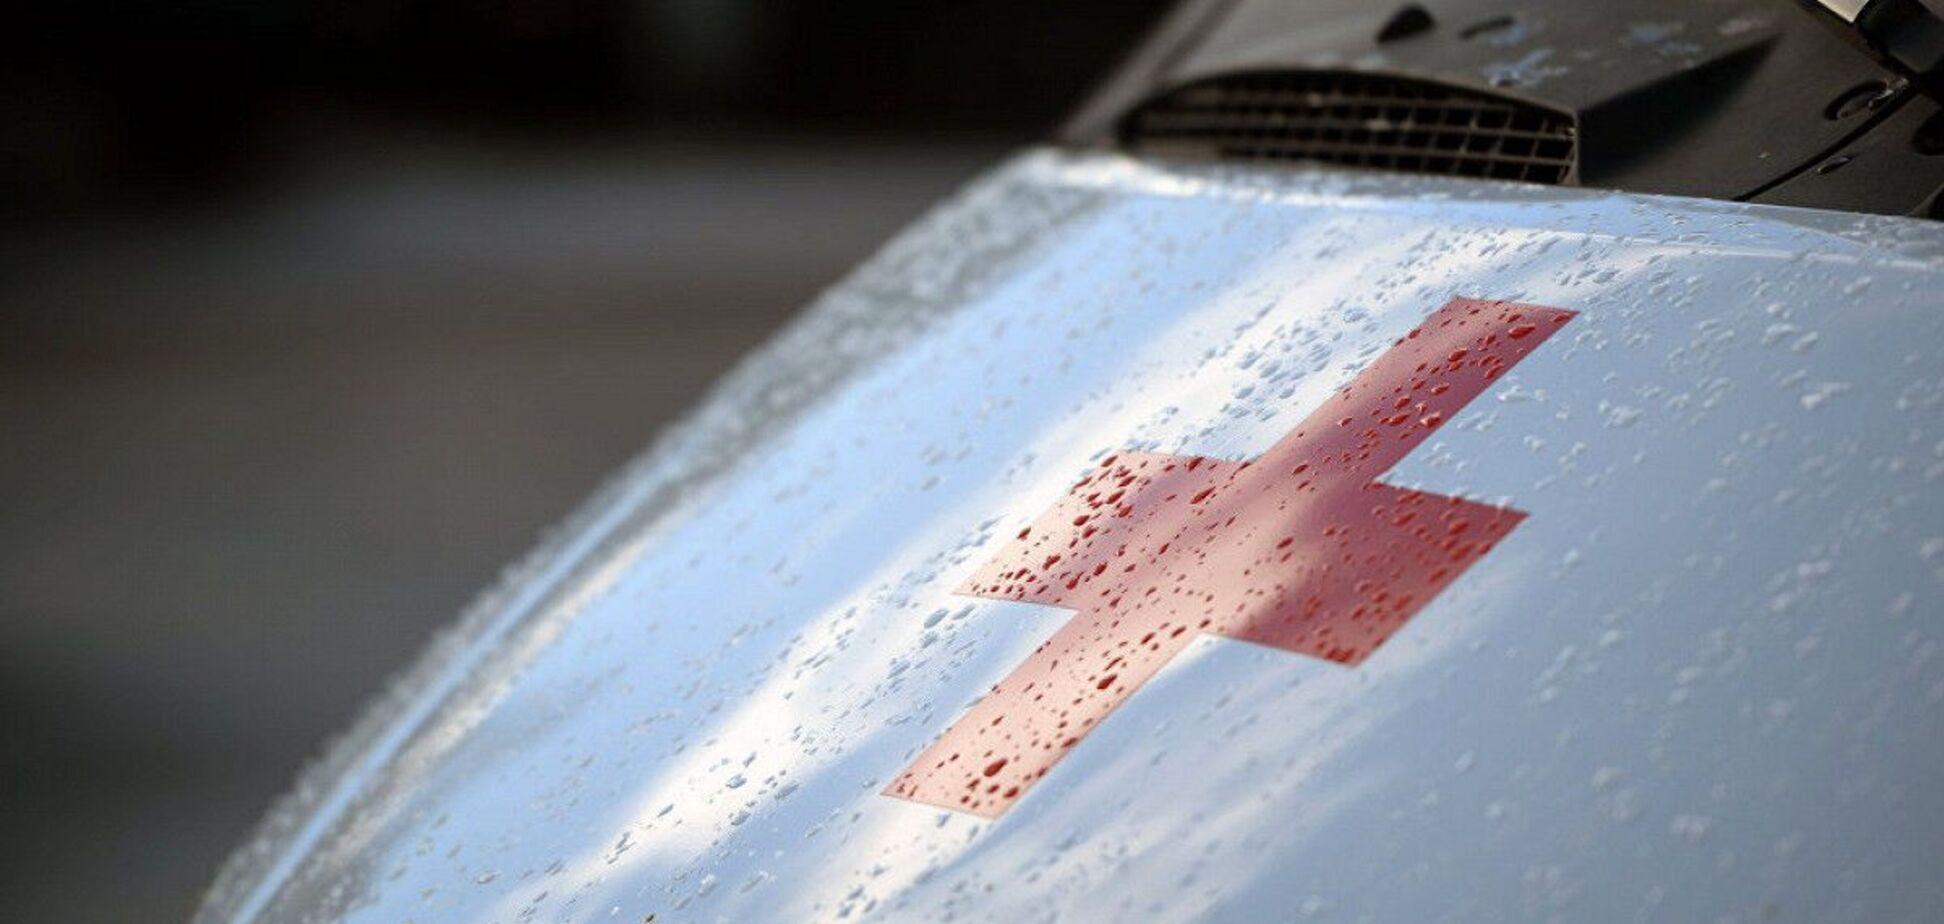 В Кривом Роге мужчина несколько раз ударил себя ножом